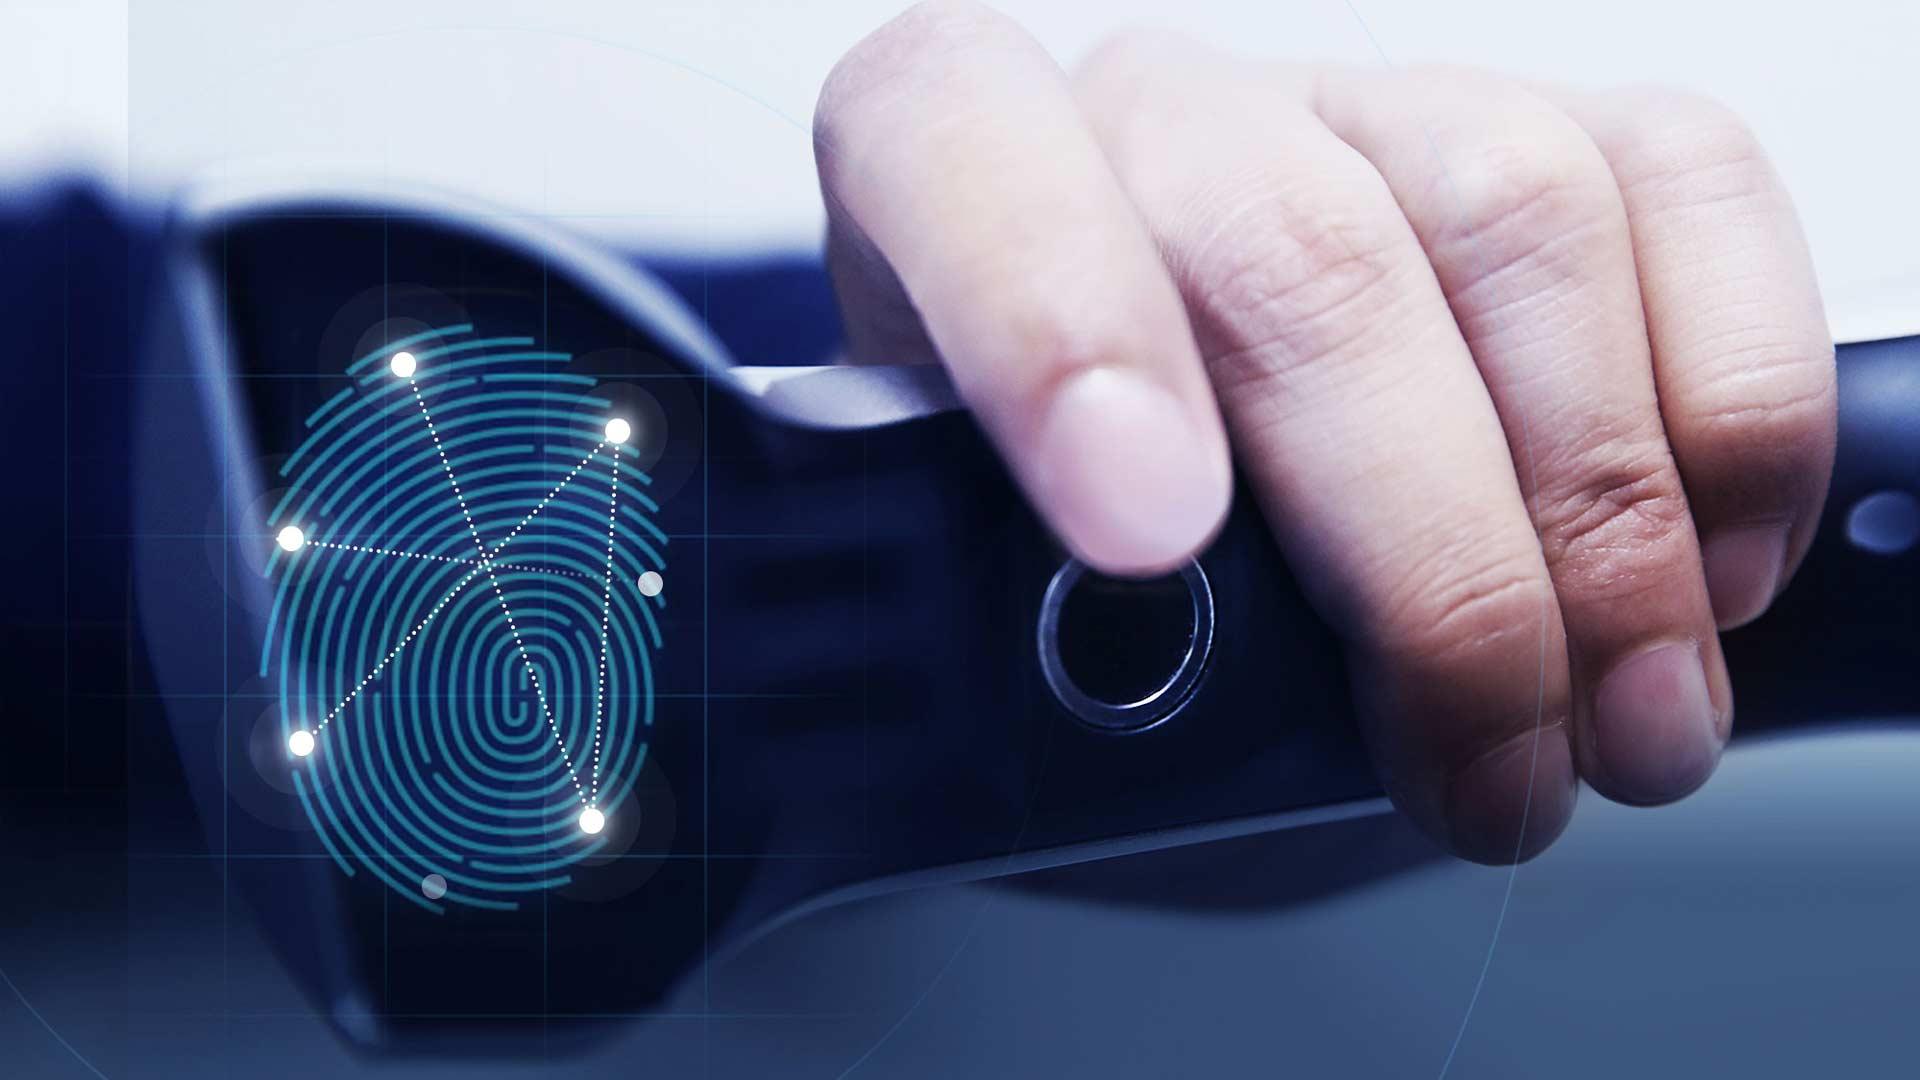 Hyundai-Fingerprint-Technology_3